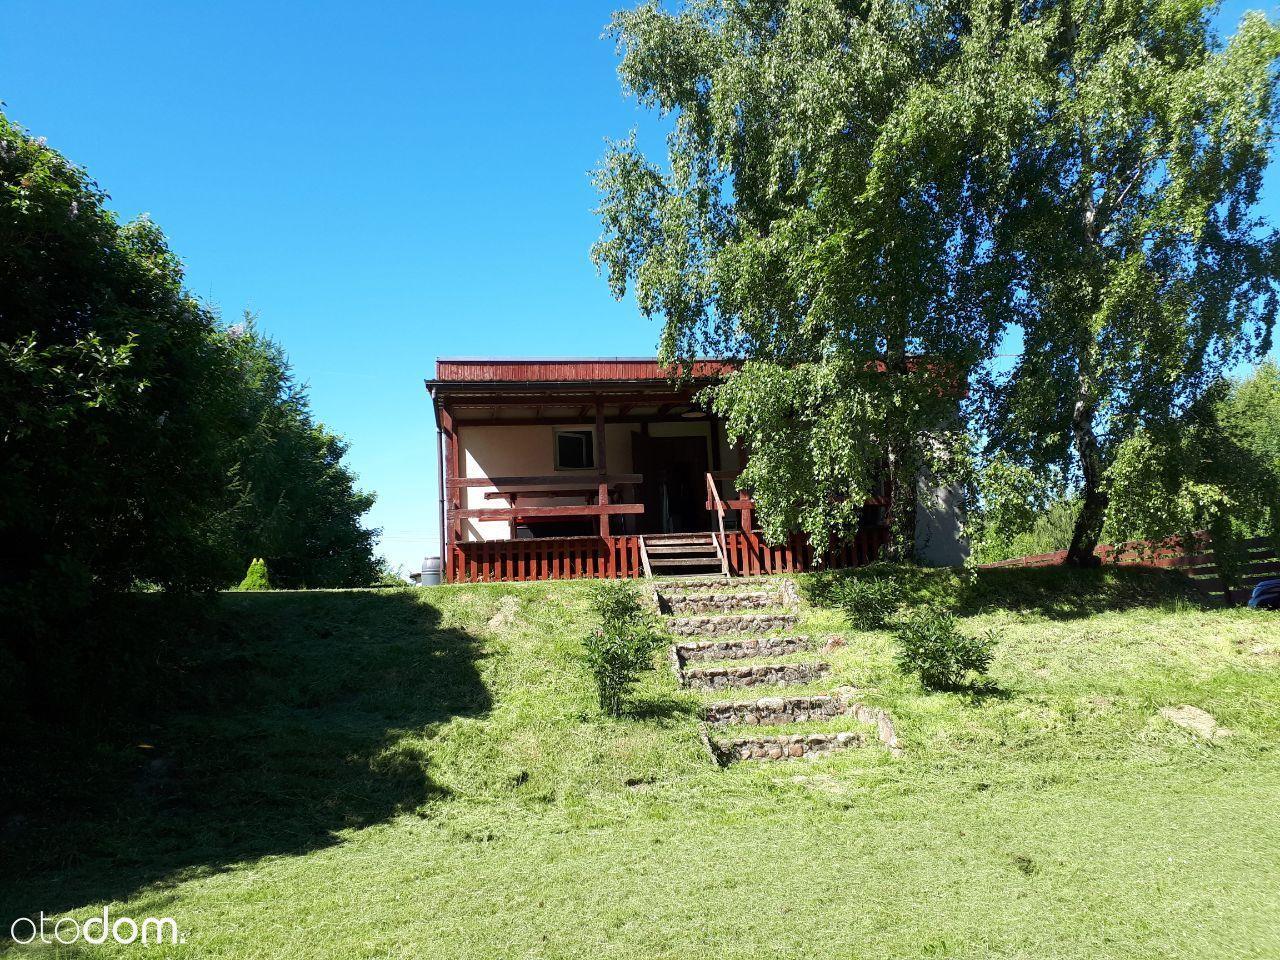 Dom nad jeziorem Resko na terenie parku